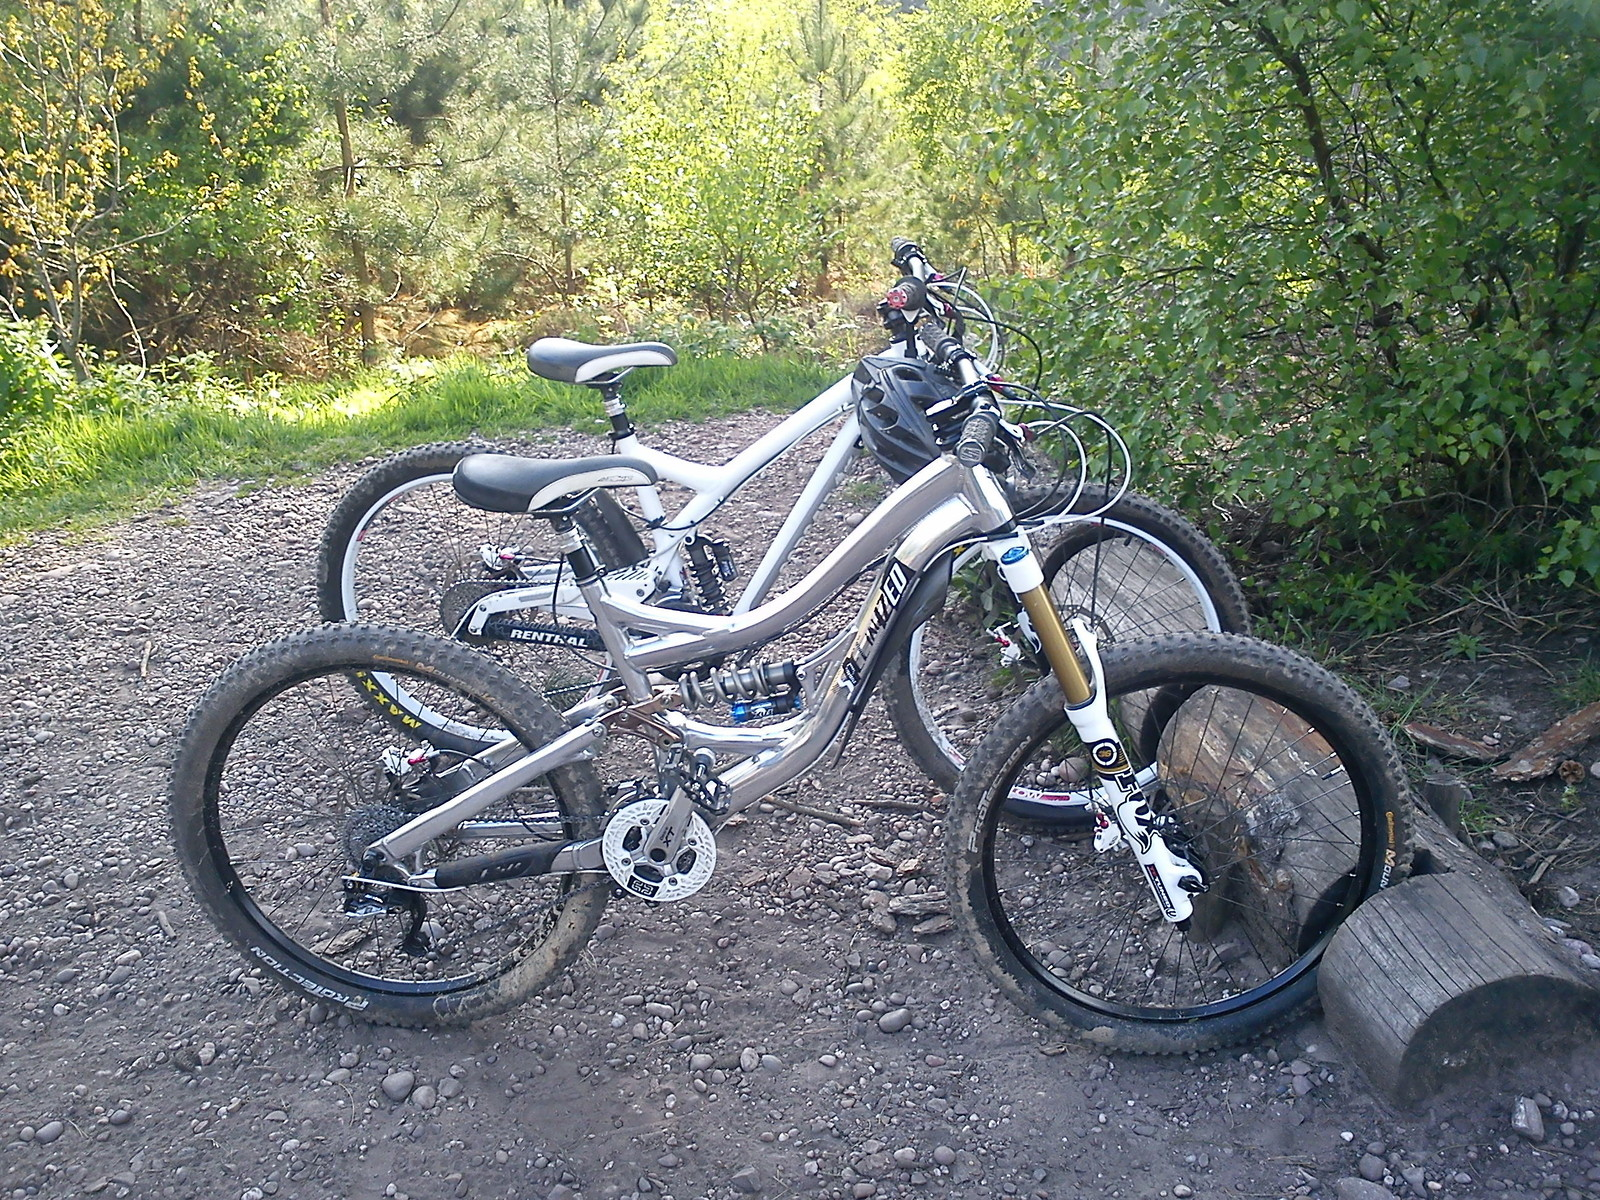 blurb2 030 - drippihippy - Mountain Biking Pictures - Vital MTB